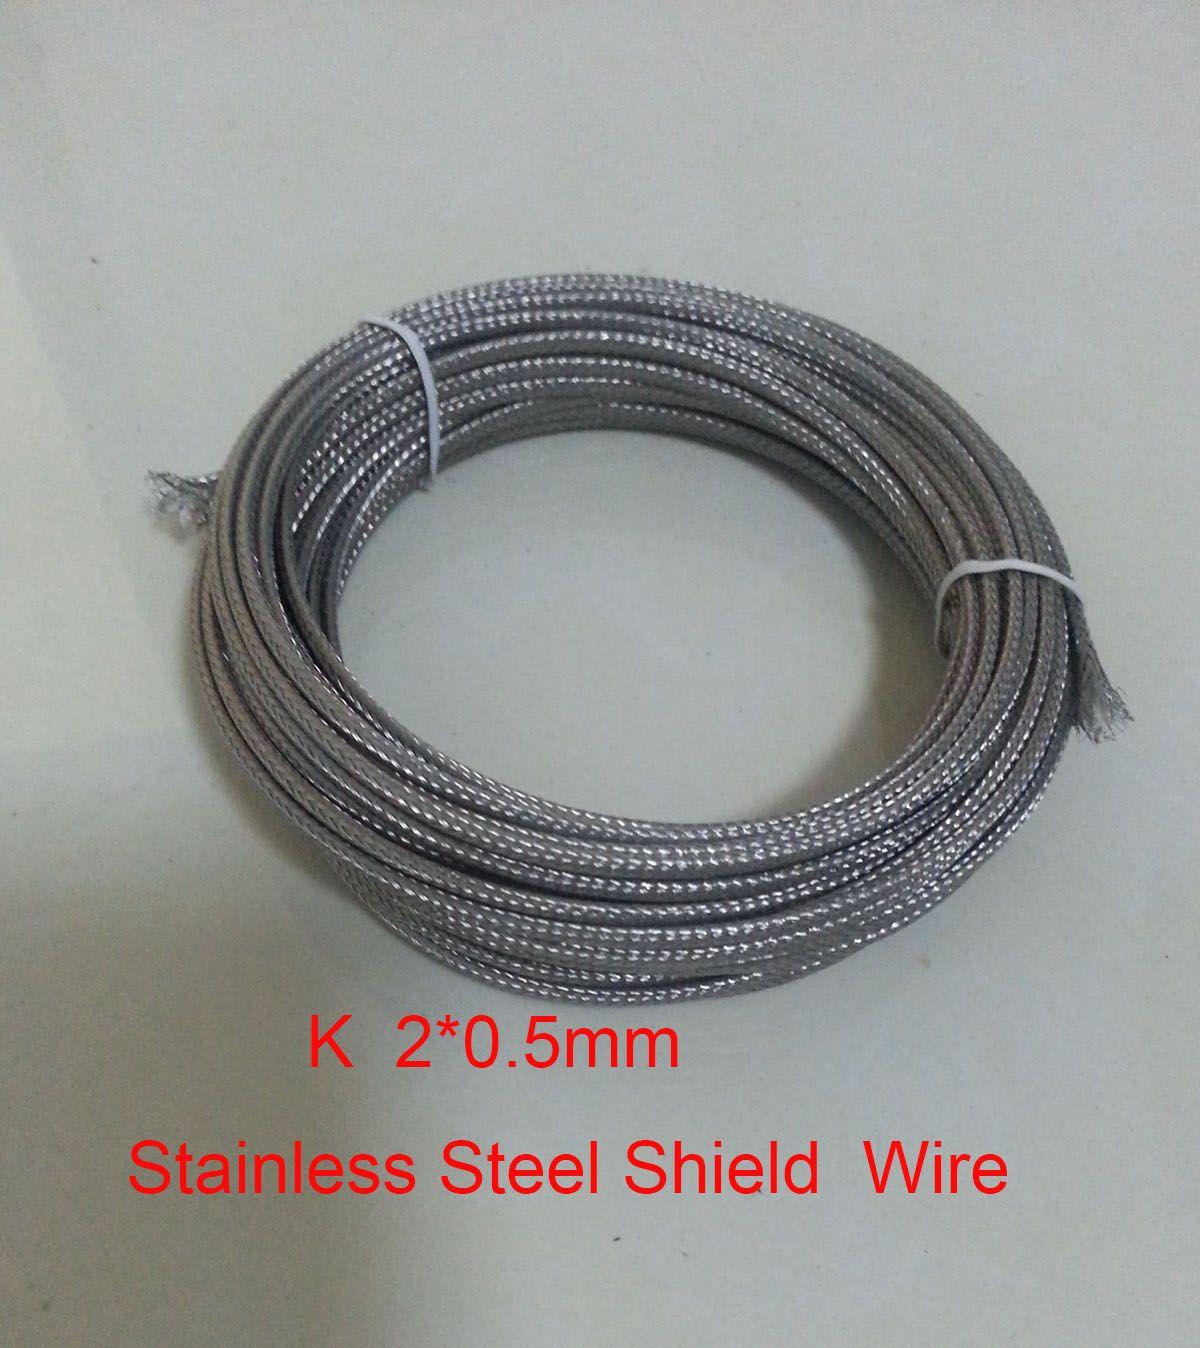 10 Meters2*0.5mm K Type Fiberglass Coated Stainless Steel Shield ...